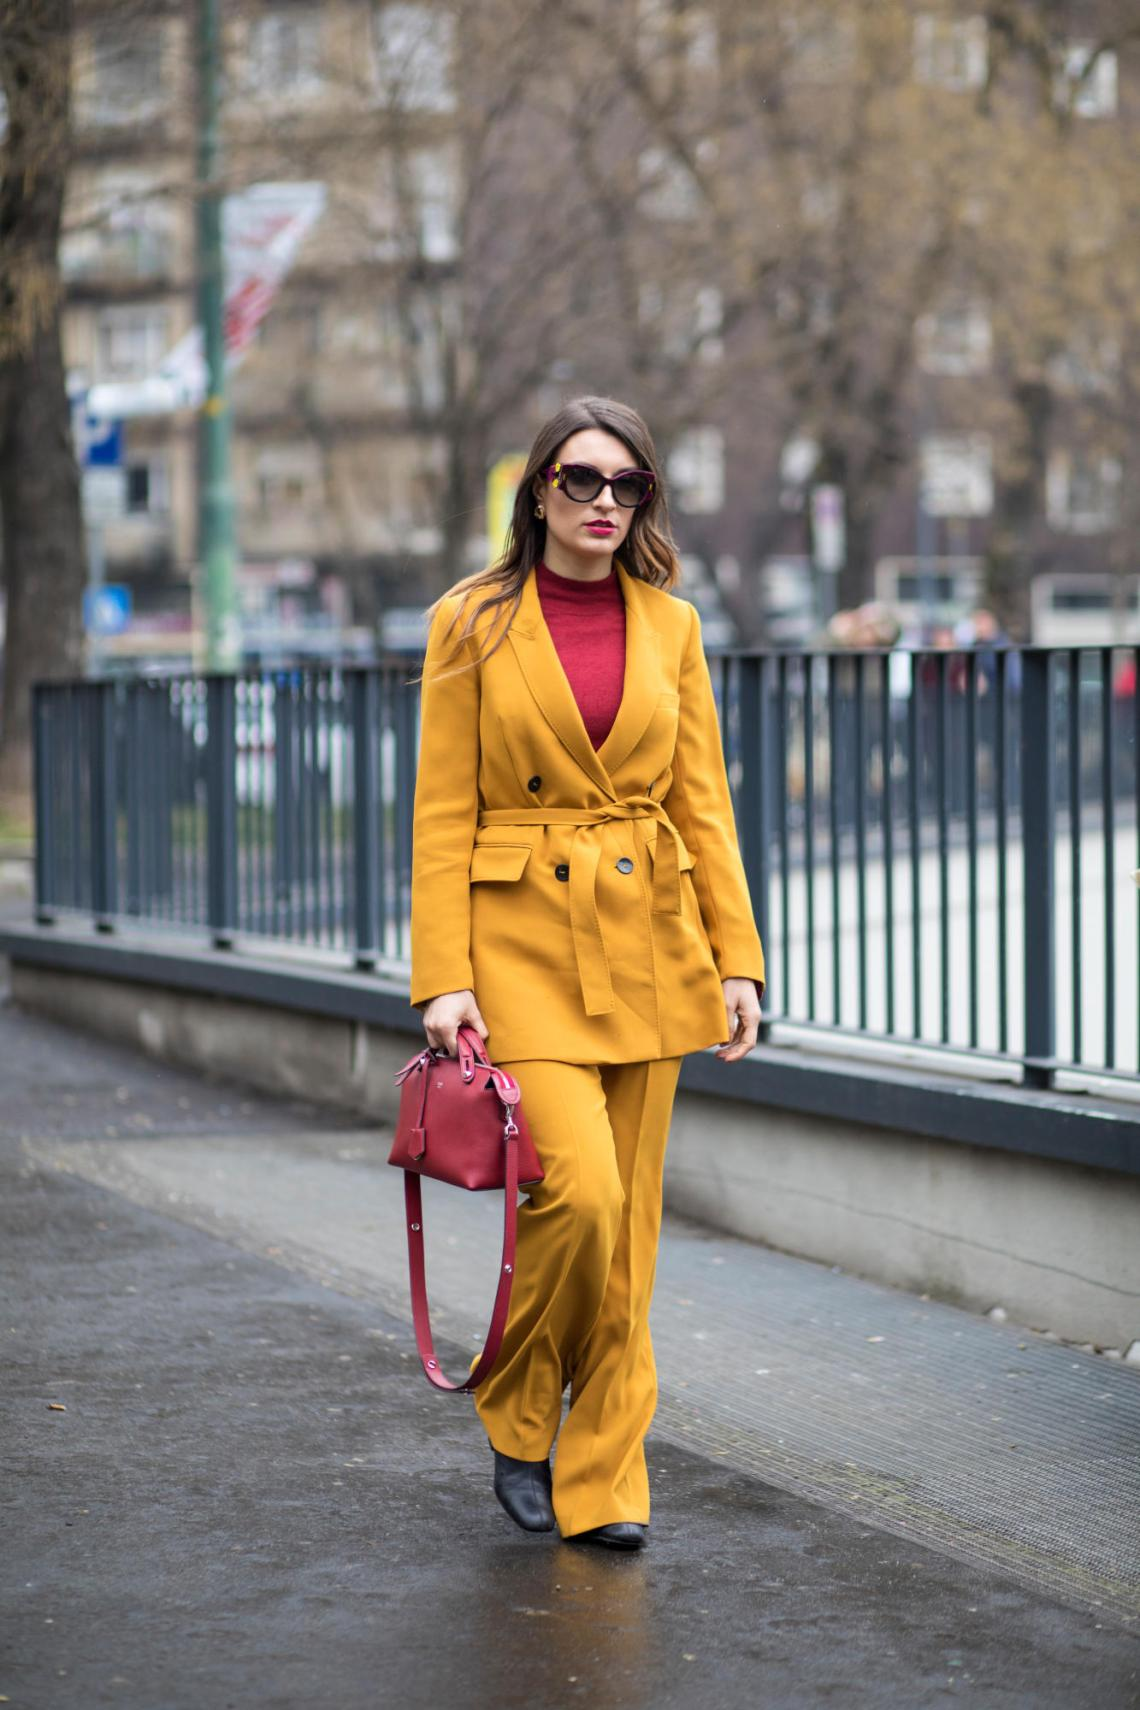 milan-fashion-week-street-style-fall-2018-day-2-7